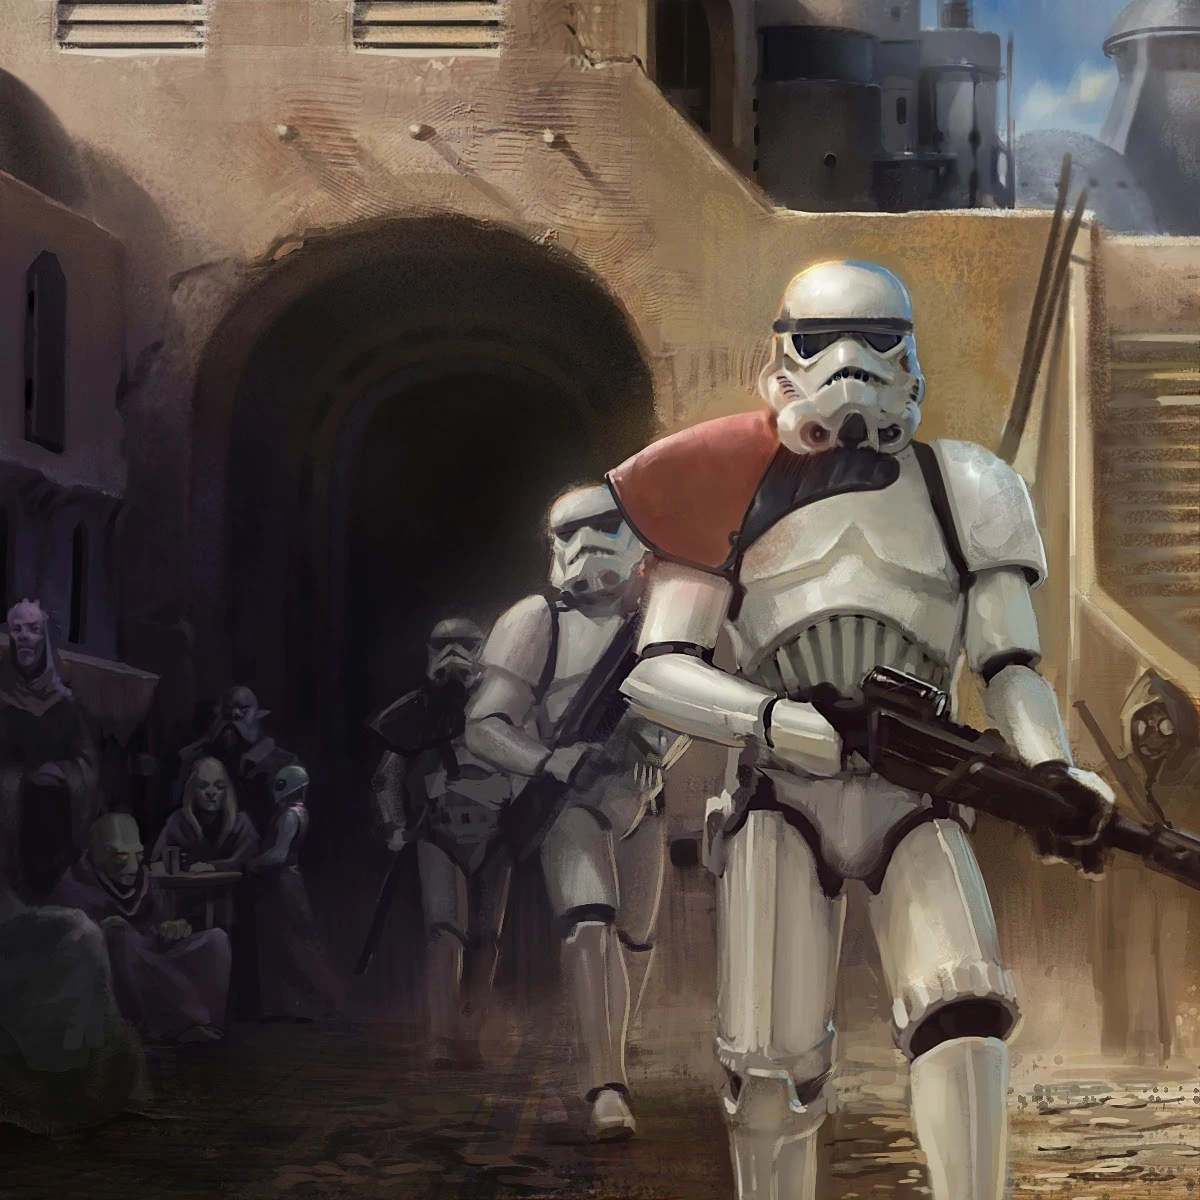 Star Wars Stormtrooper Concept Art